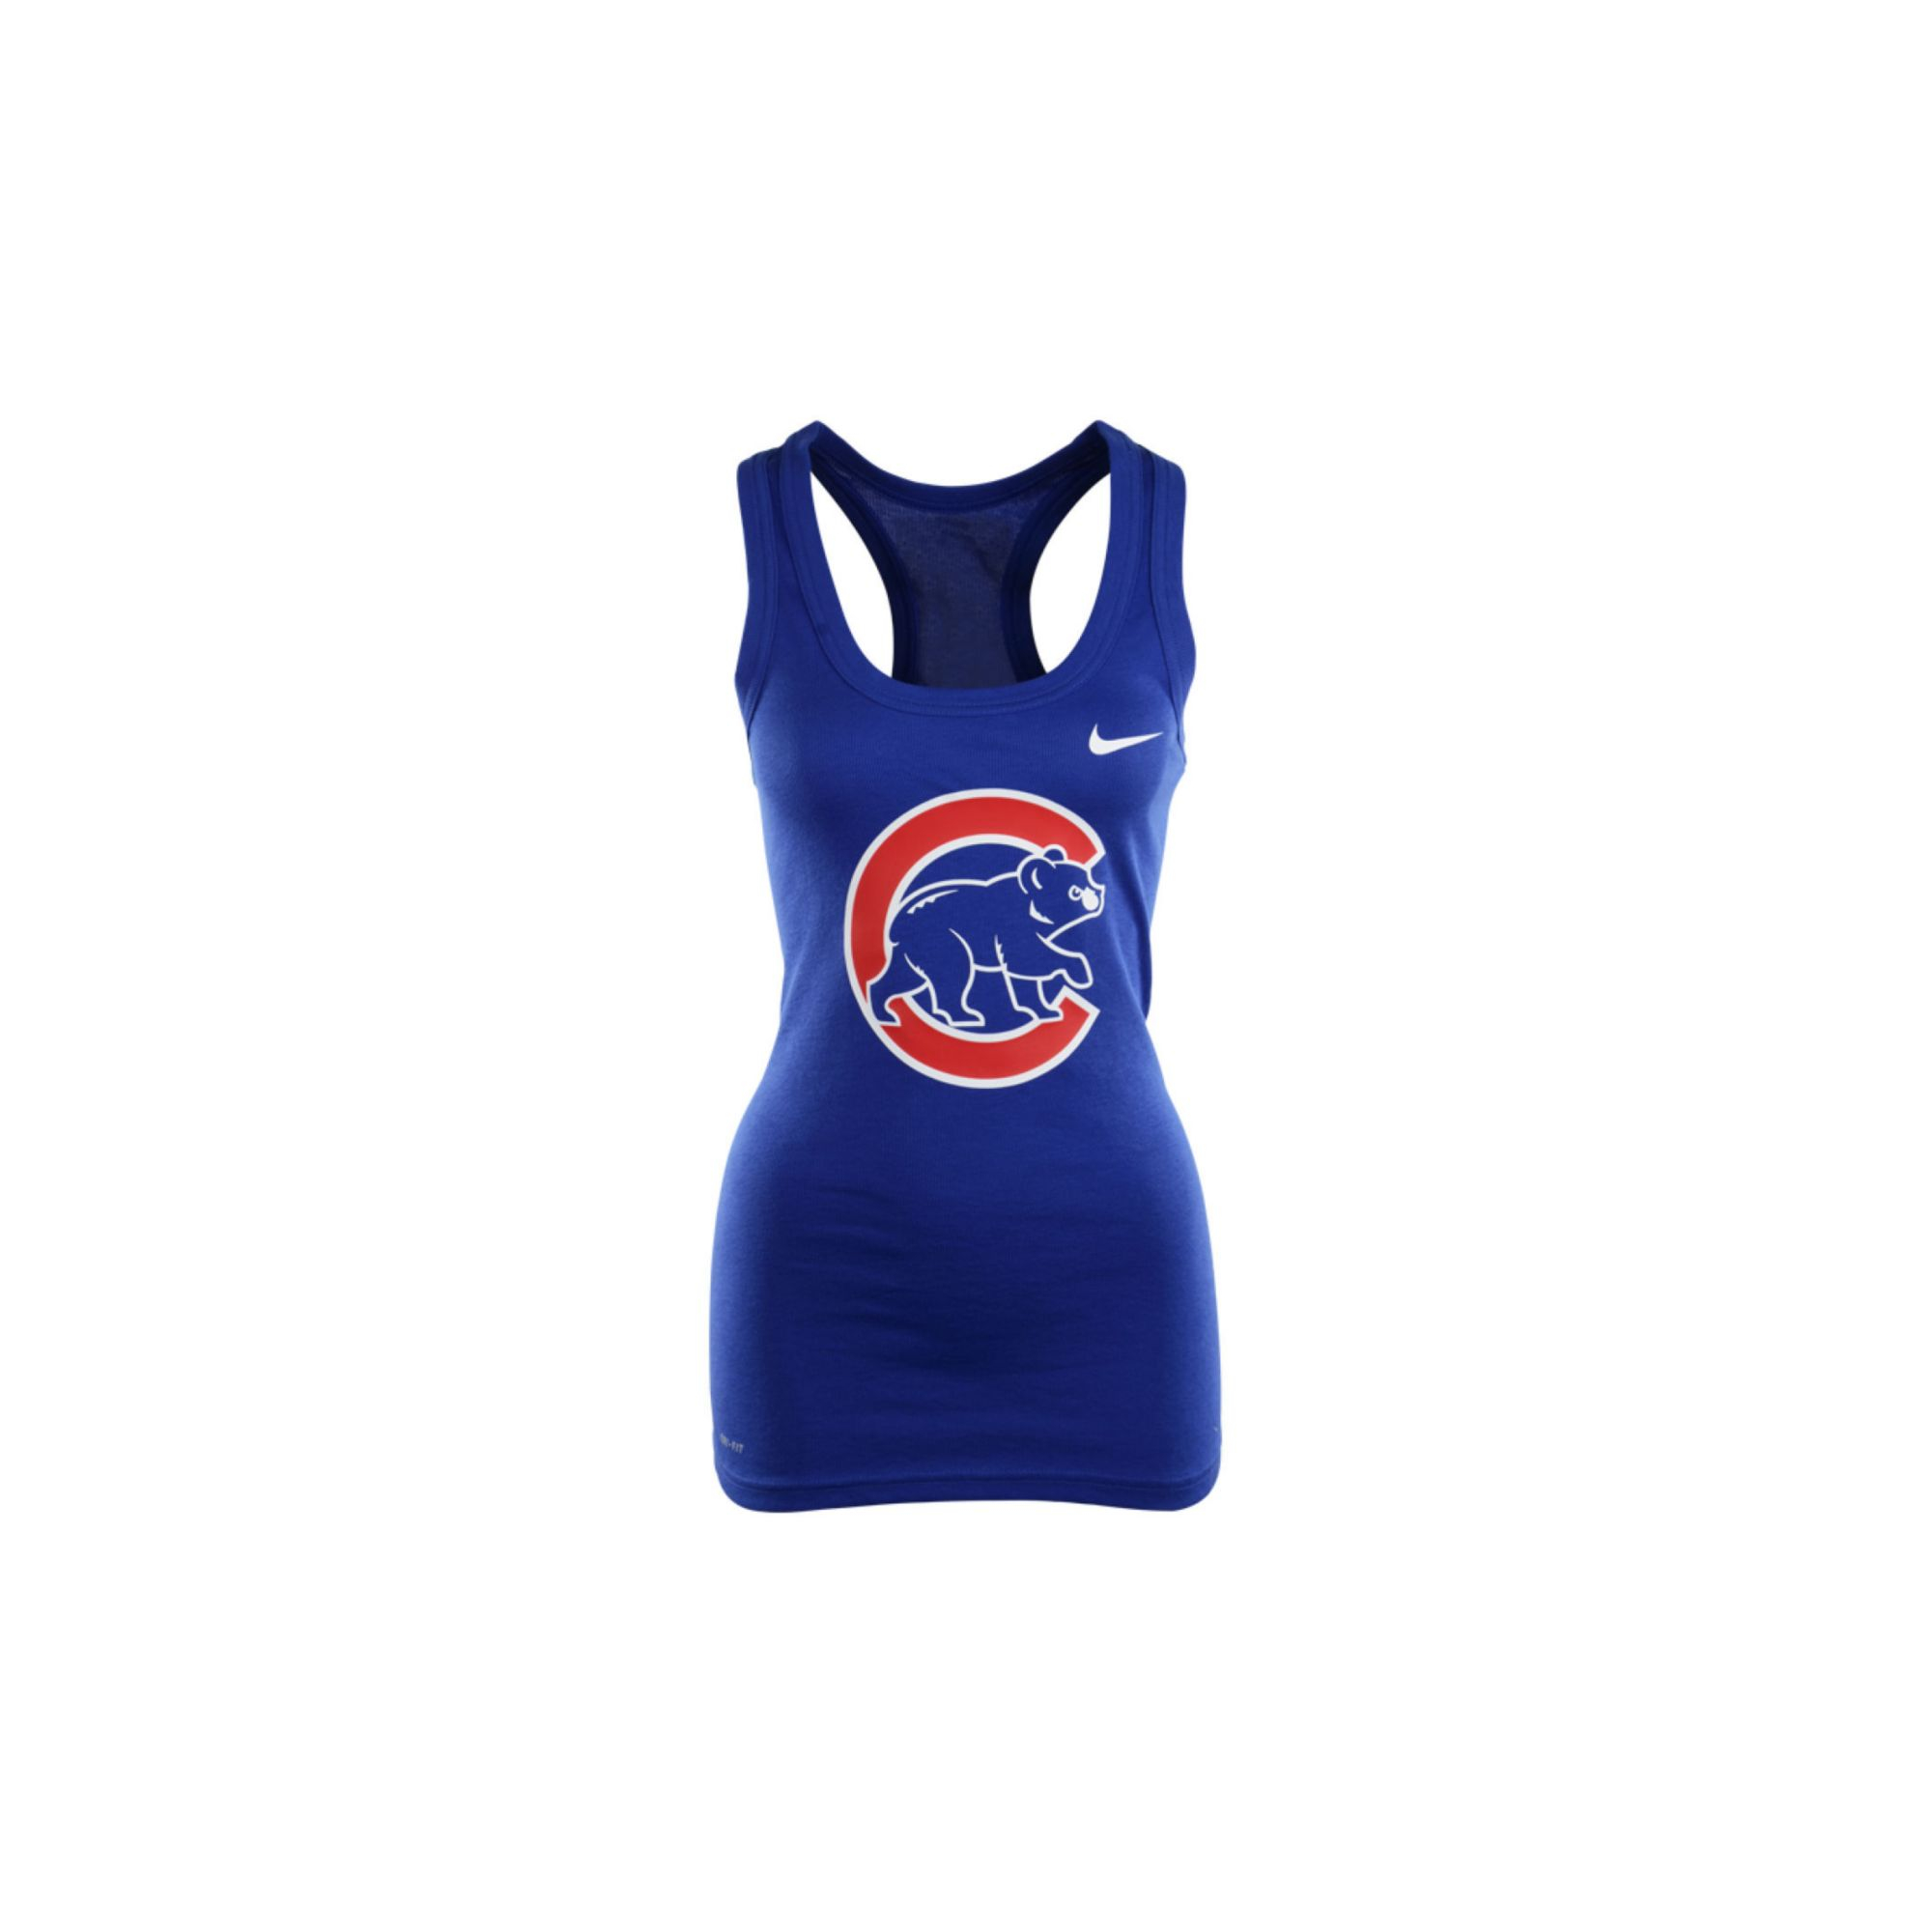 b94293045e16cd Lyst - Nike Womens Chicago Cubs Drifit Racerback Tank Top in Blue